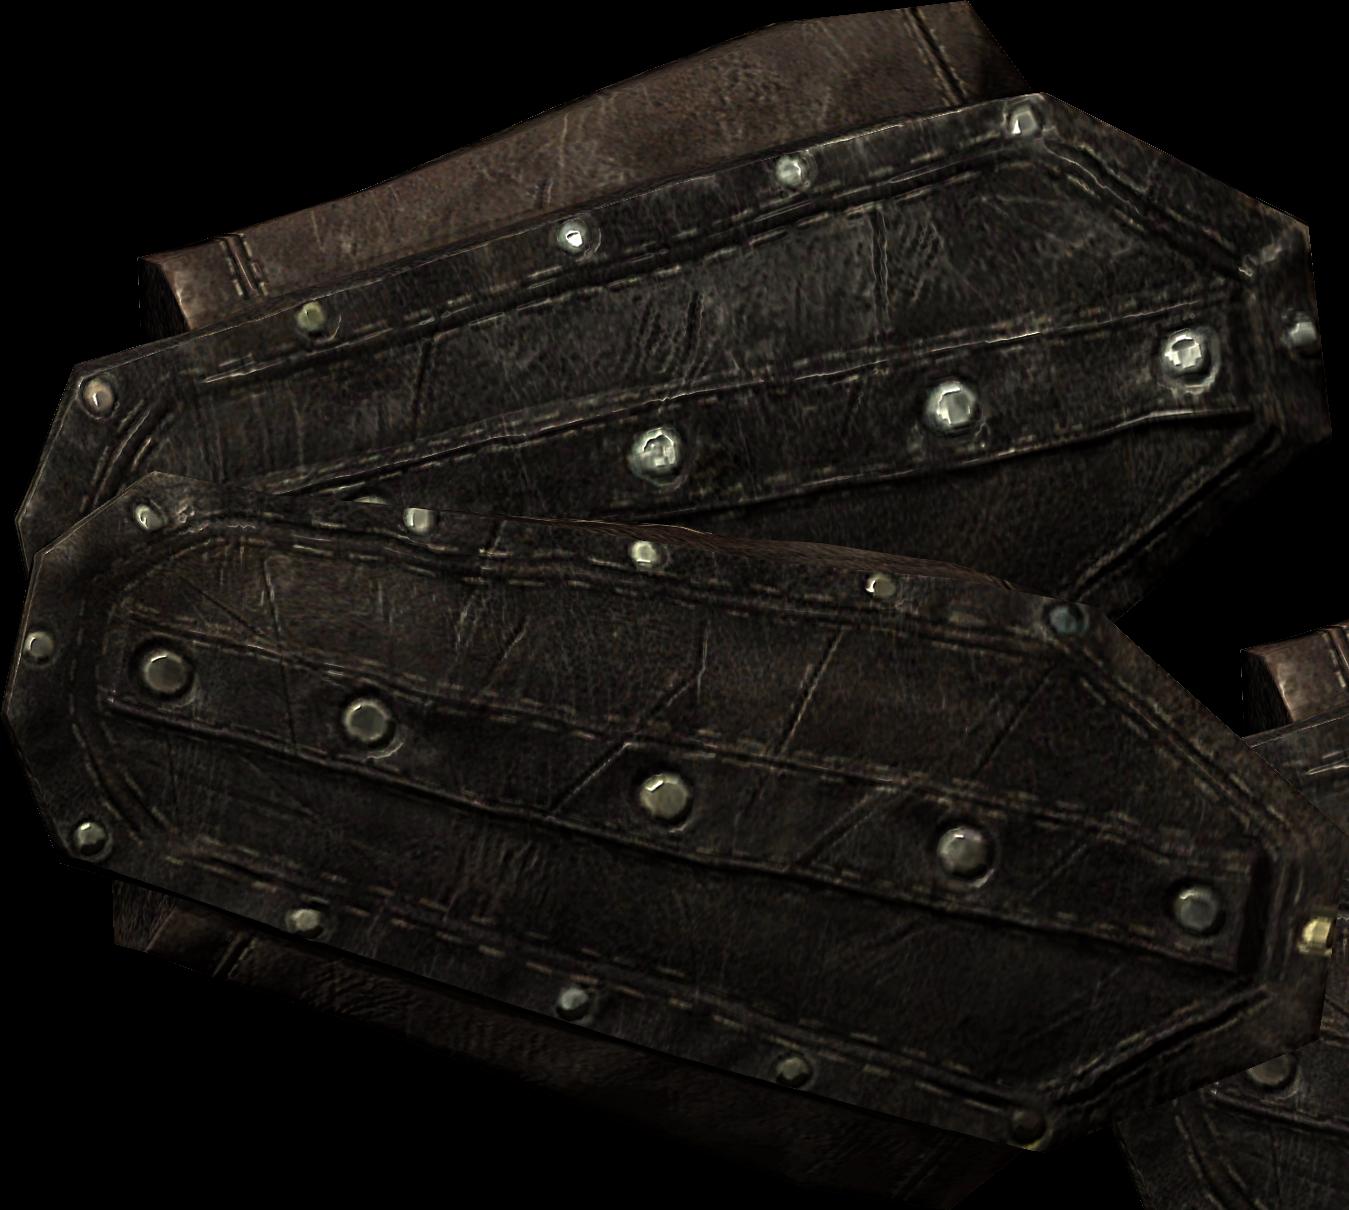 Black leather gloves skyrim - Black Leather Gloves Skyrim 50